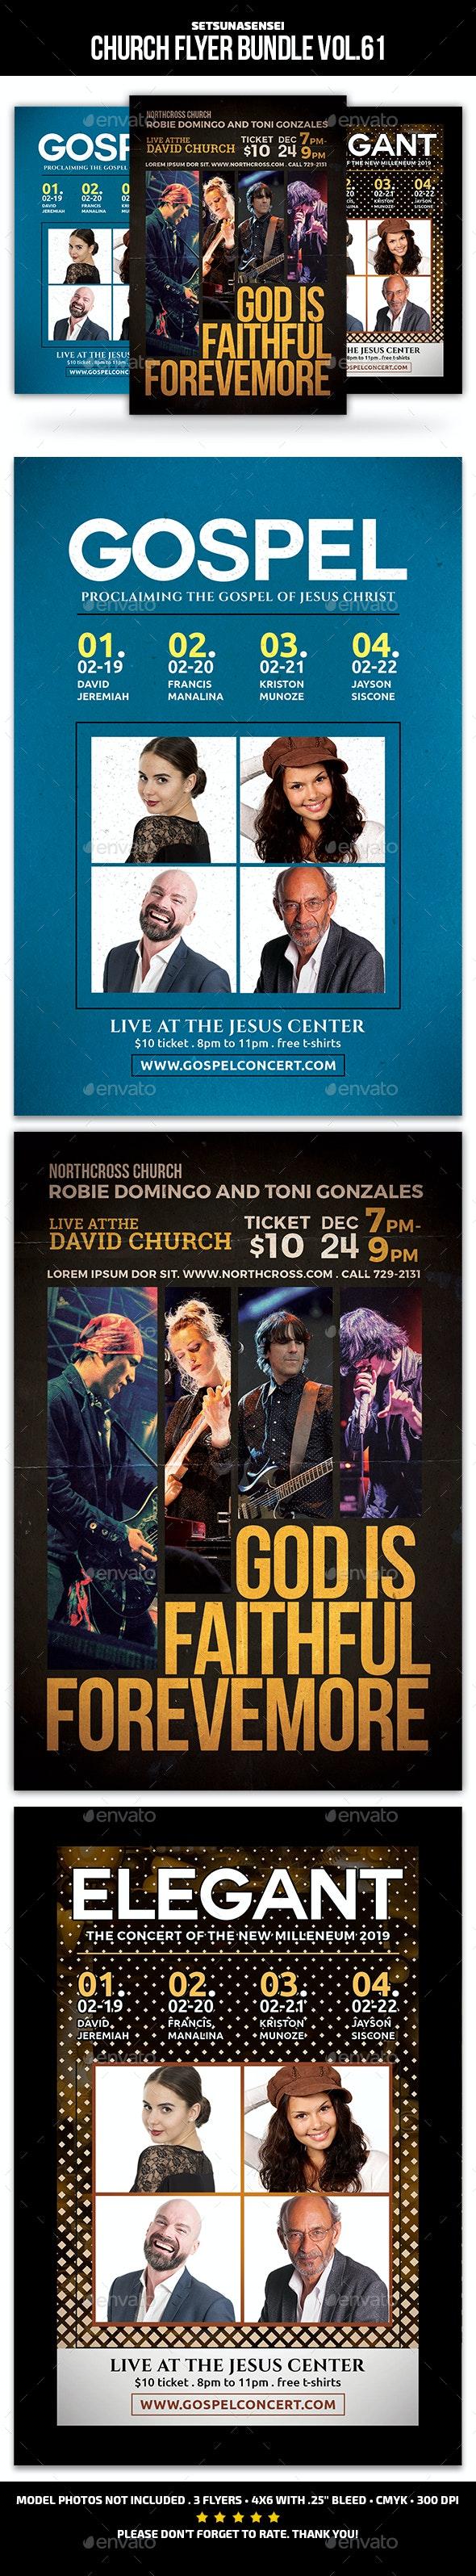 Church Flyer Bundle Vol. 61 - Church Flyers